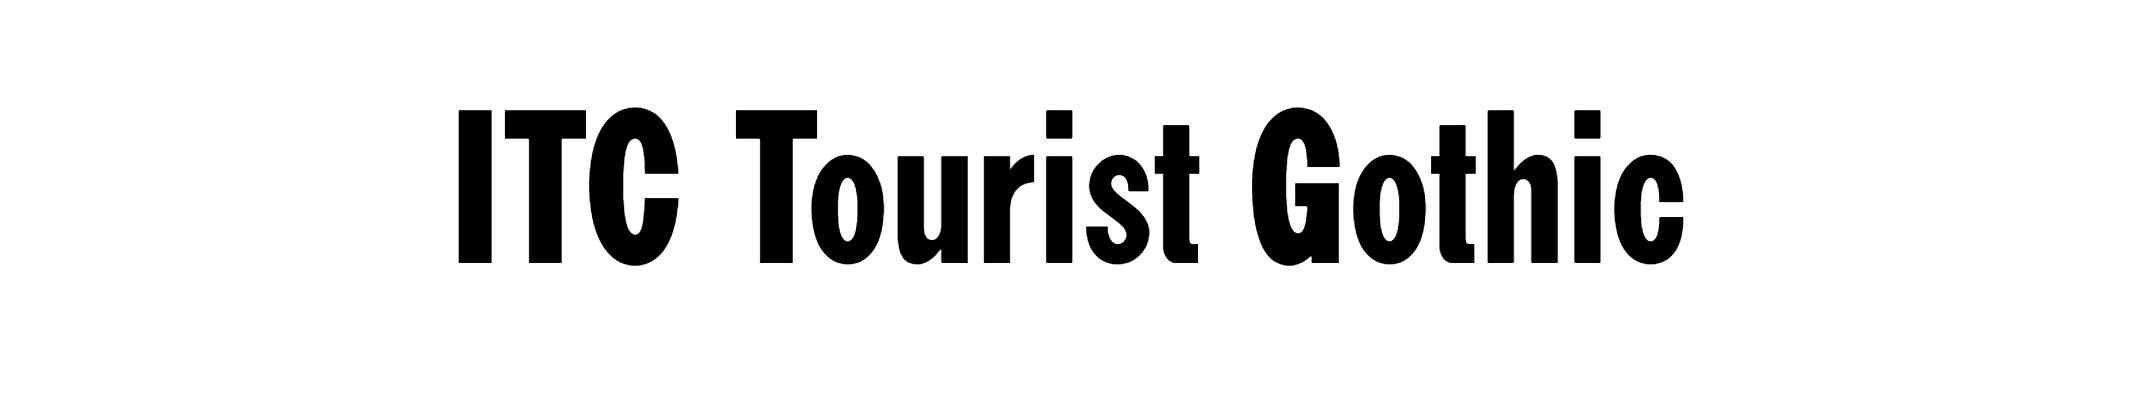 ITC Tourist Gothic